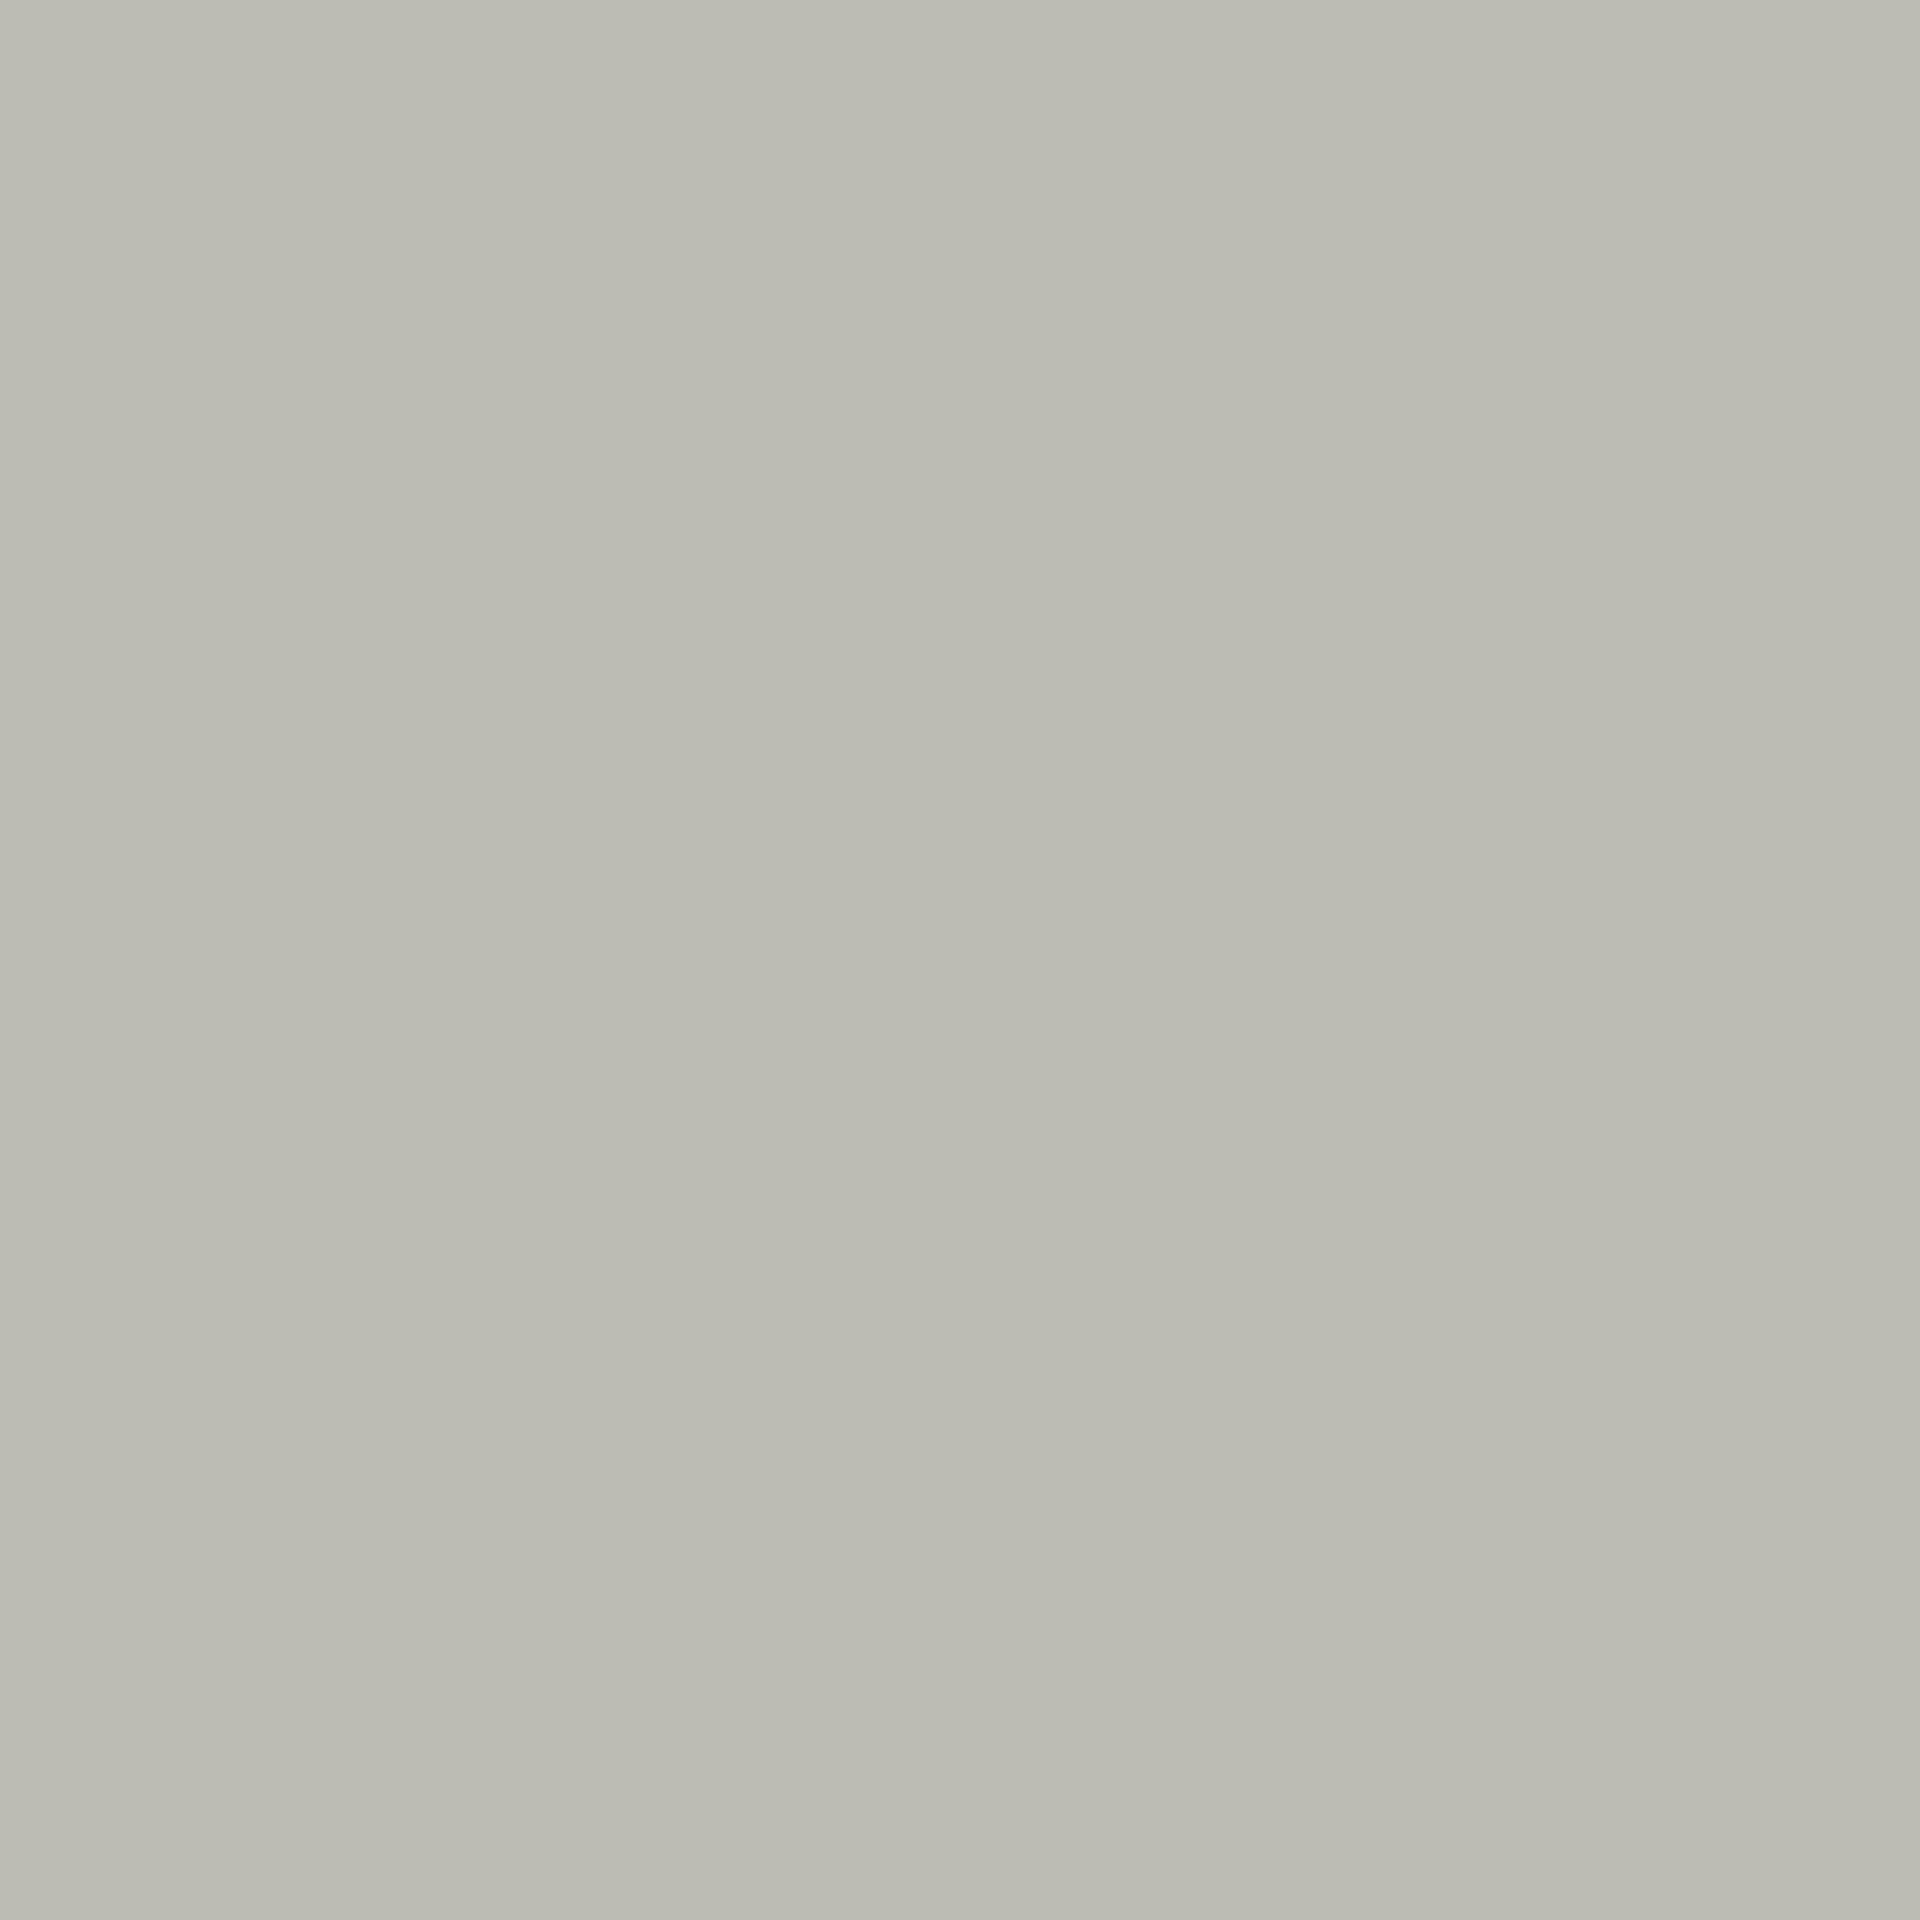 Testeur Peinture Mur Boiserie Radiateur Luxens Khol 5 Satin 0 05 Leroy Merlin